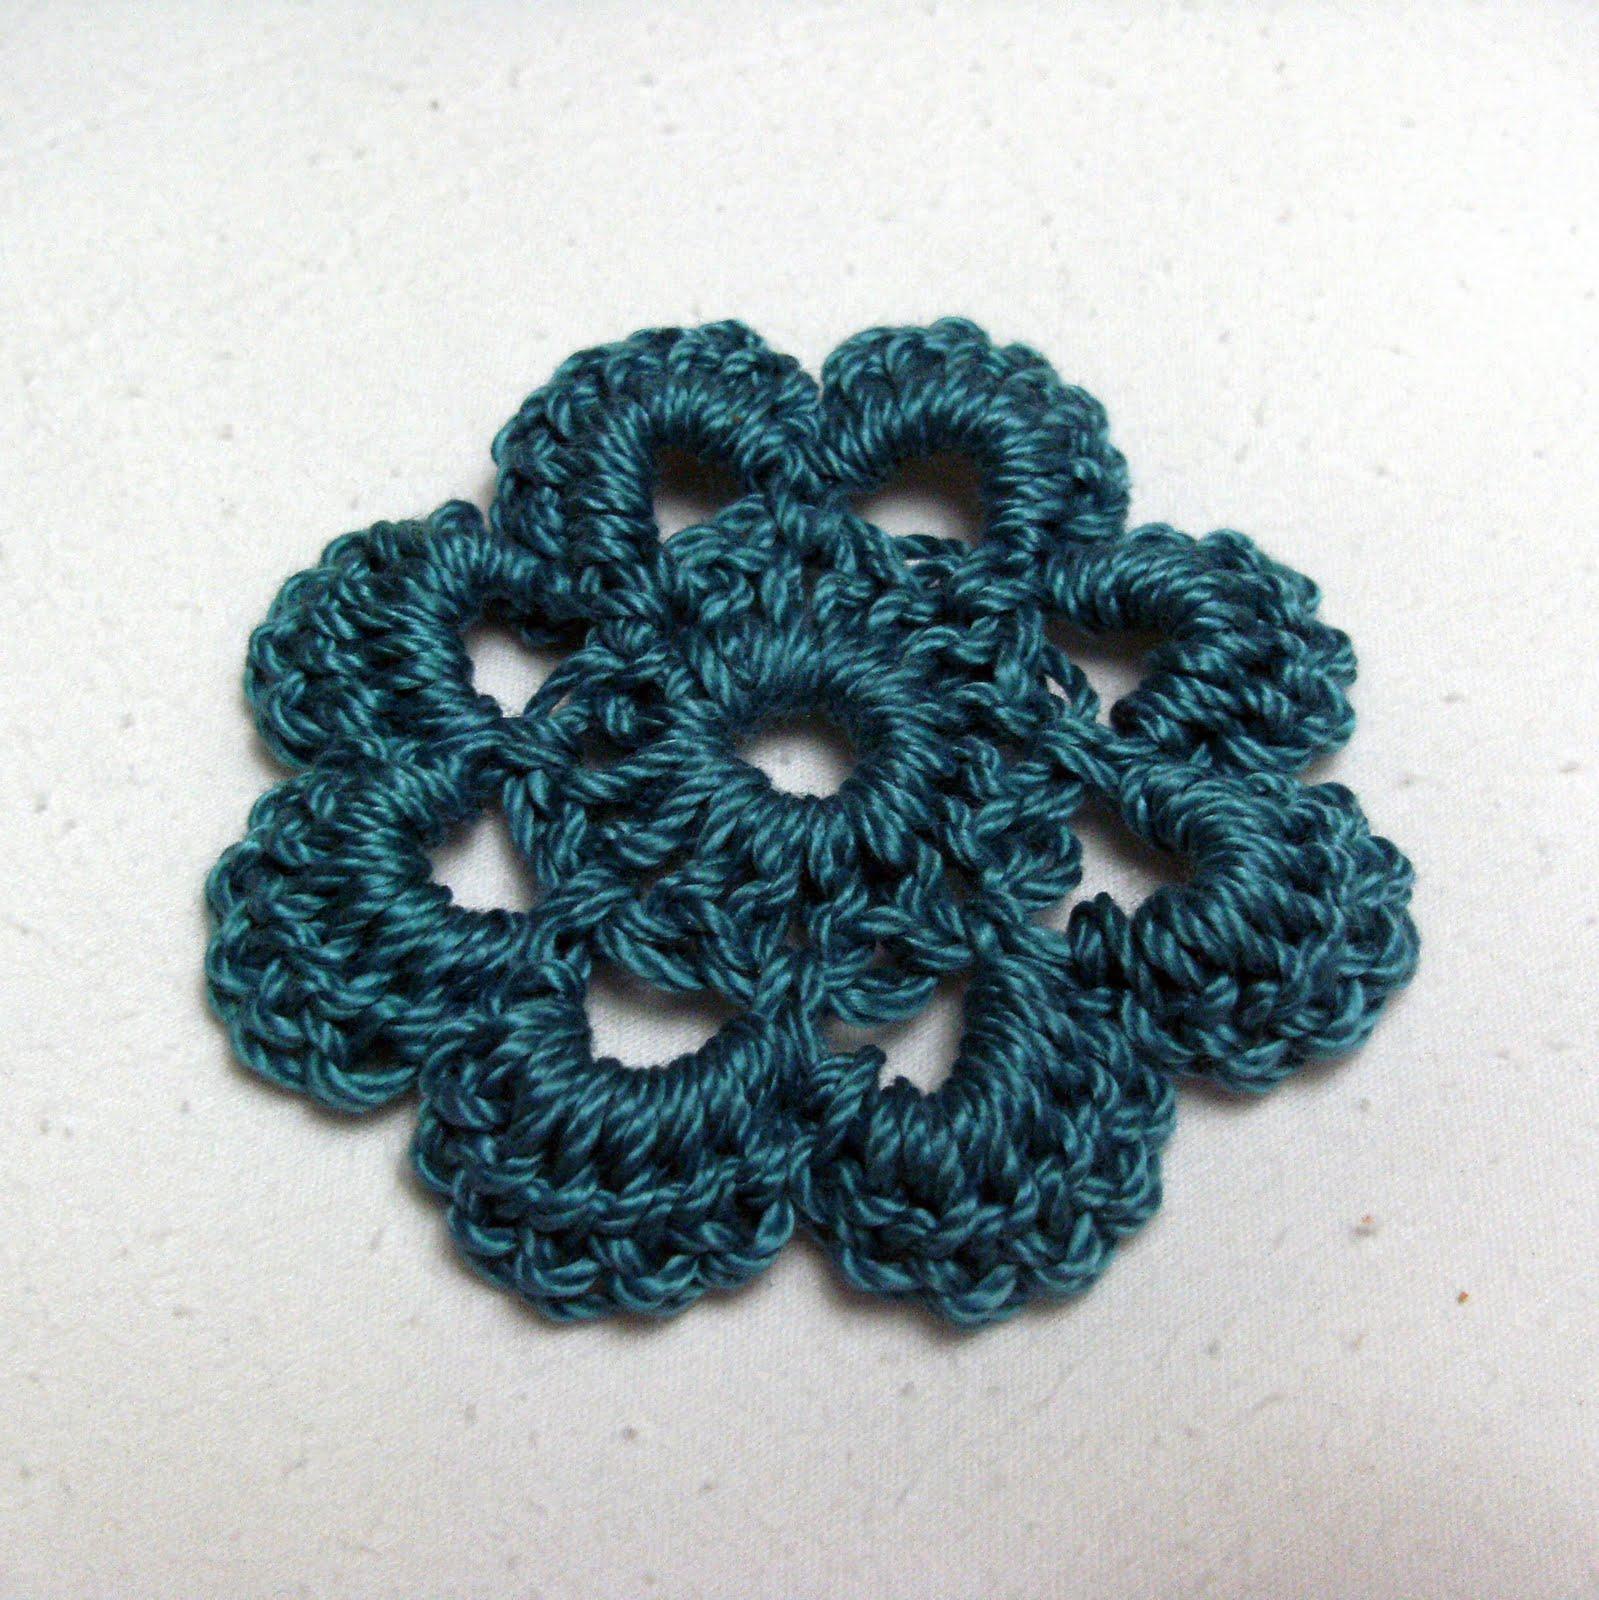 Crochet Outline Stitch : crochet flower stitches